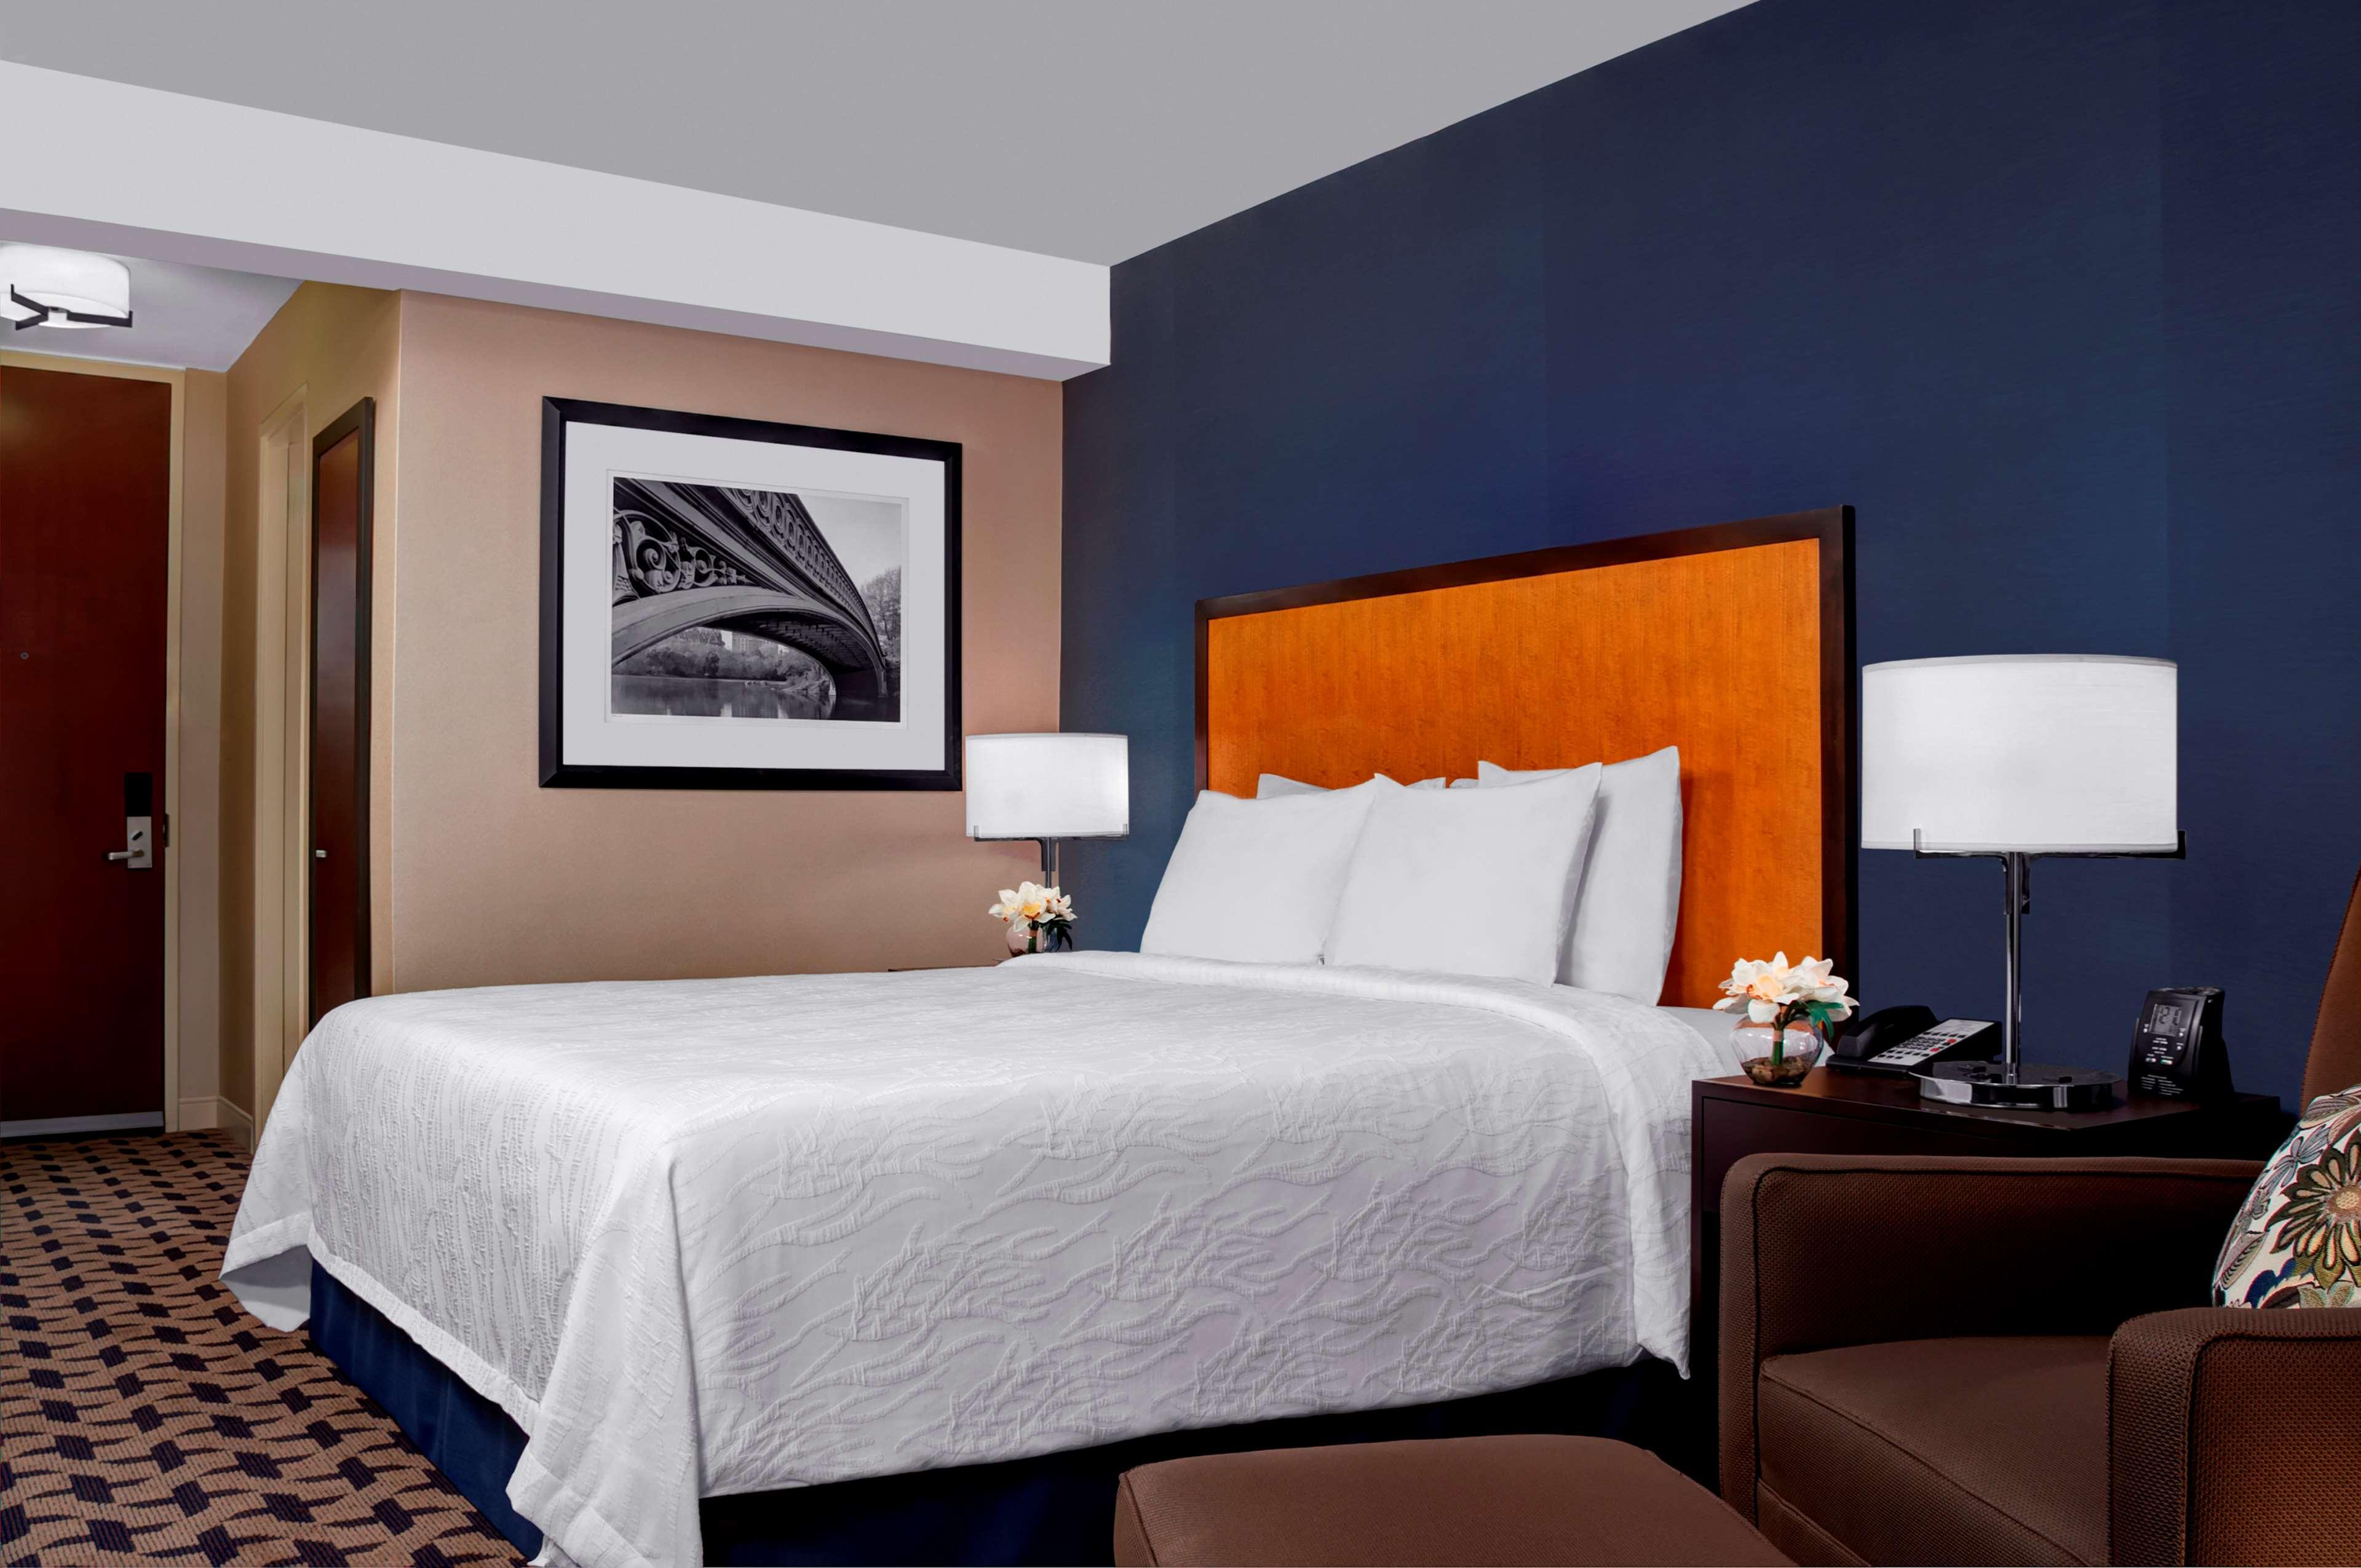 Hilton Garden Inn Times Square image 7